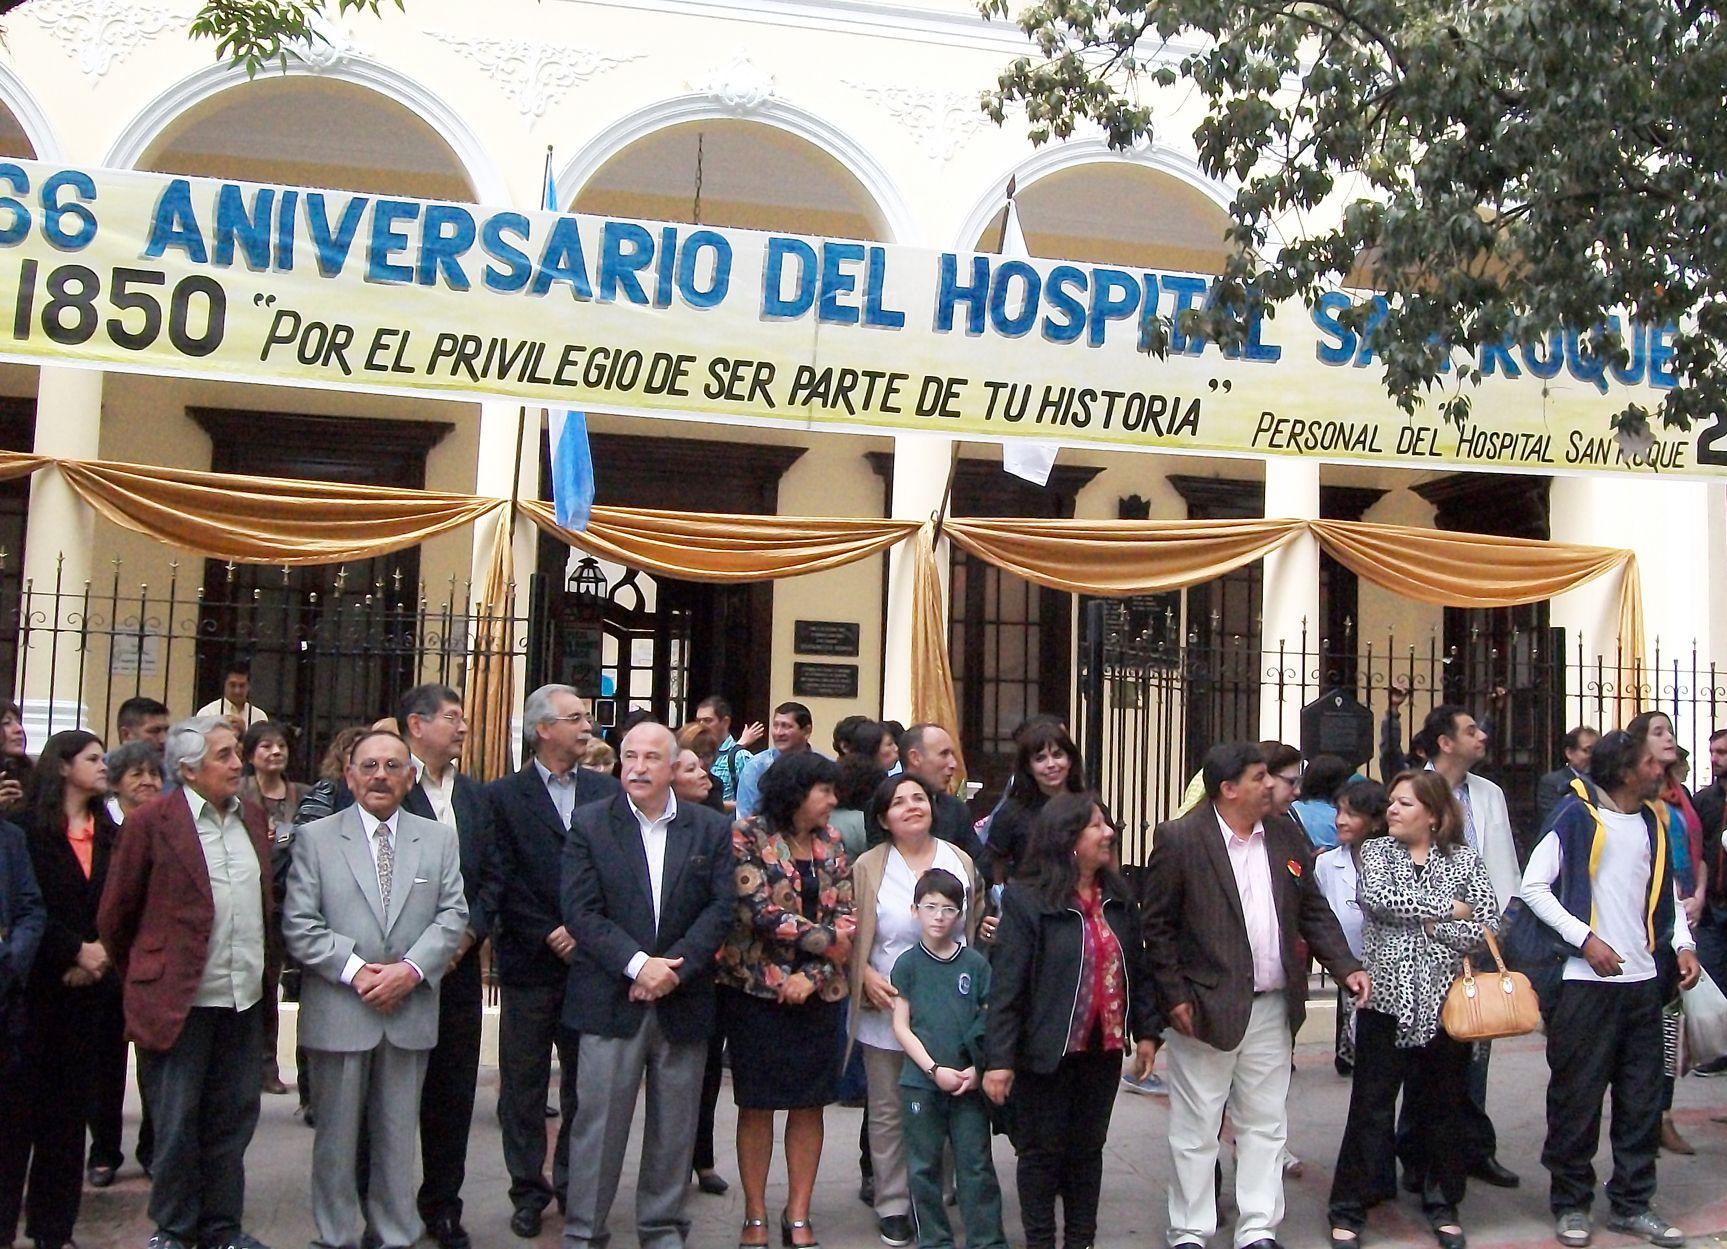 031016 Aniversario San Roque 12